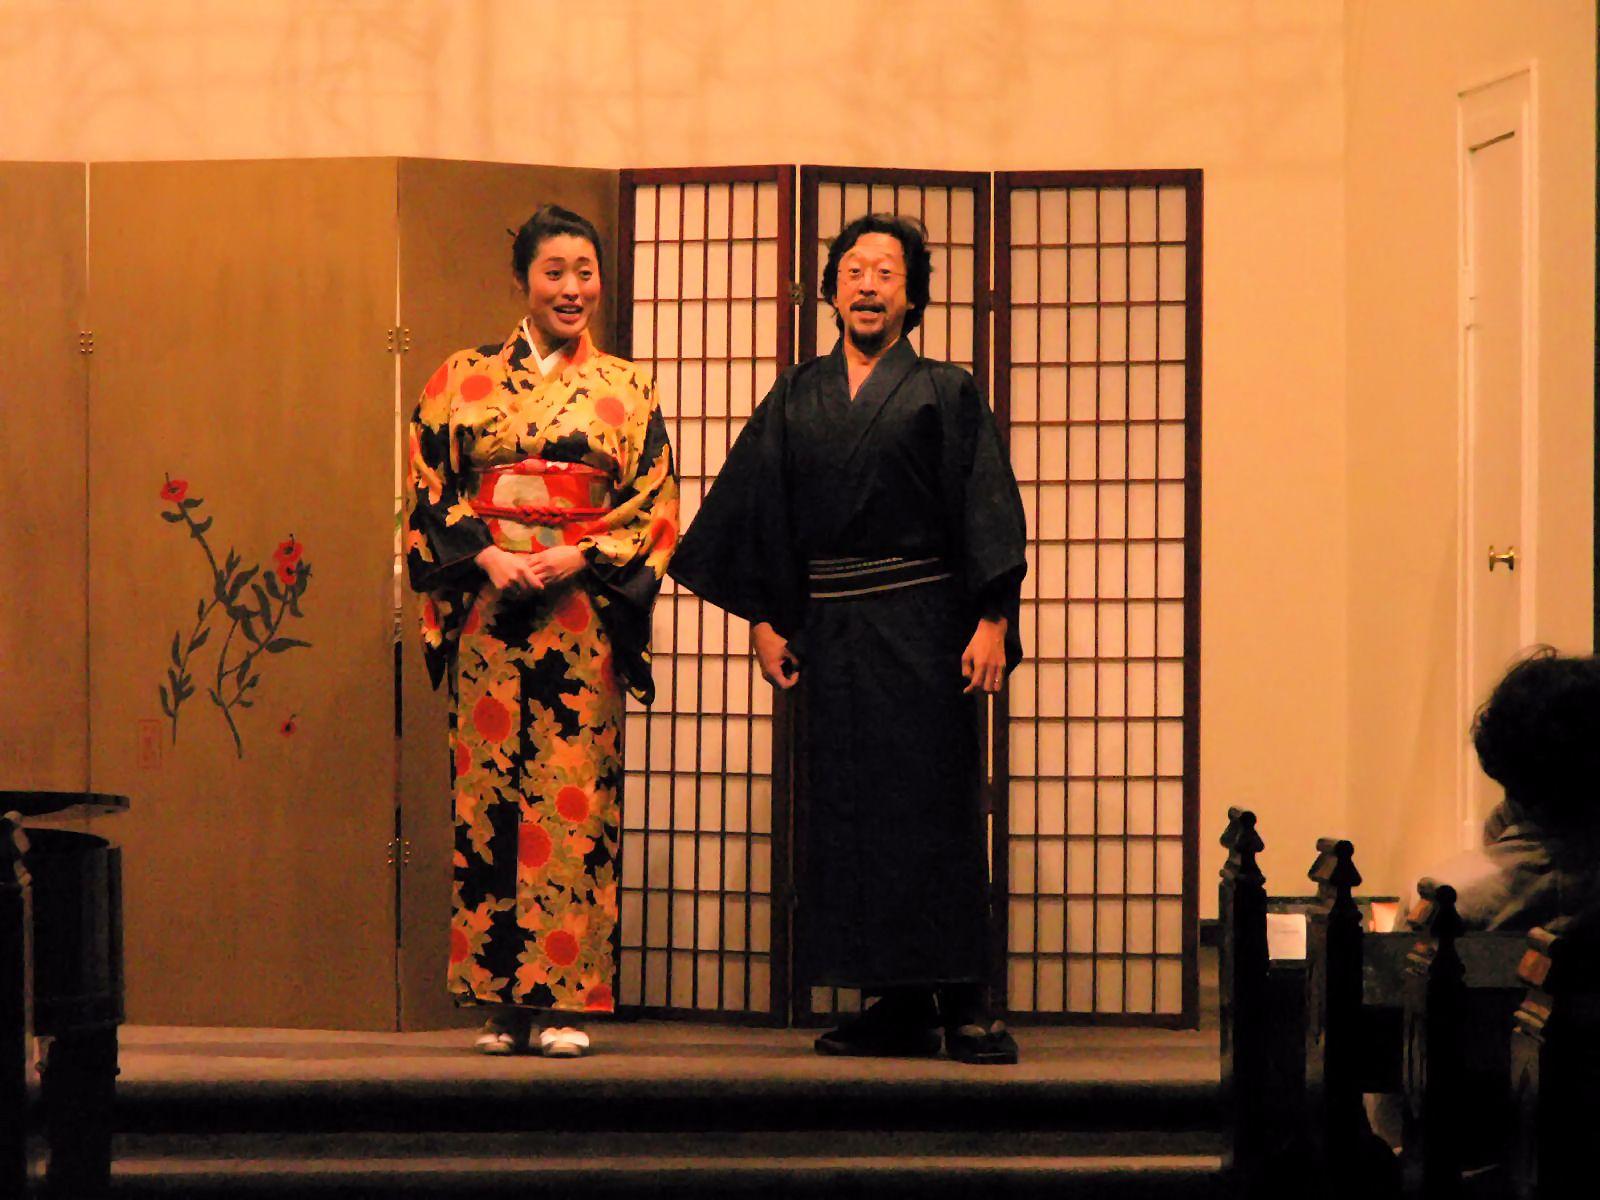 Chiharu Sato und Shuichi Umino